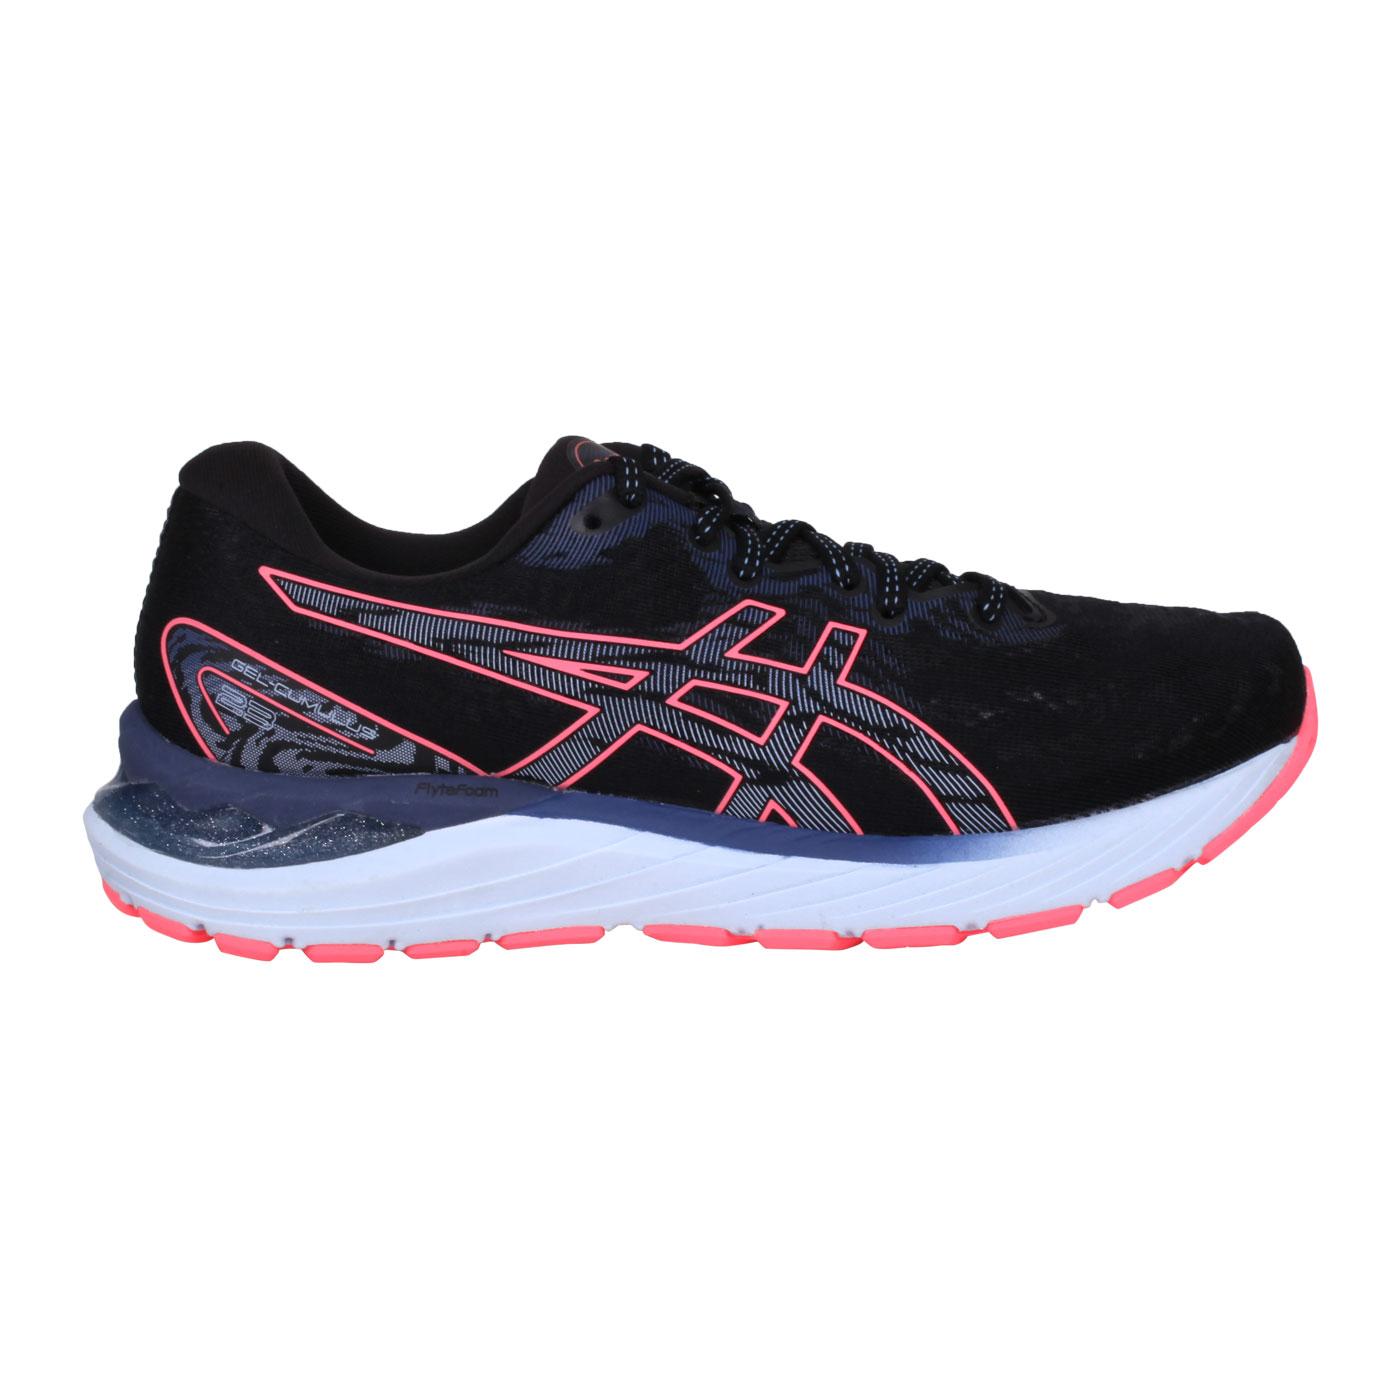 ASICS 女款慢跑鞋  @GEL-CUMULUS 23@1012A888-019